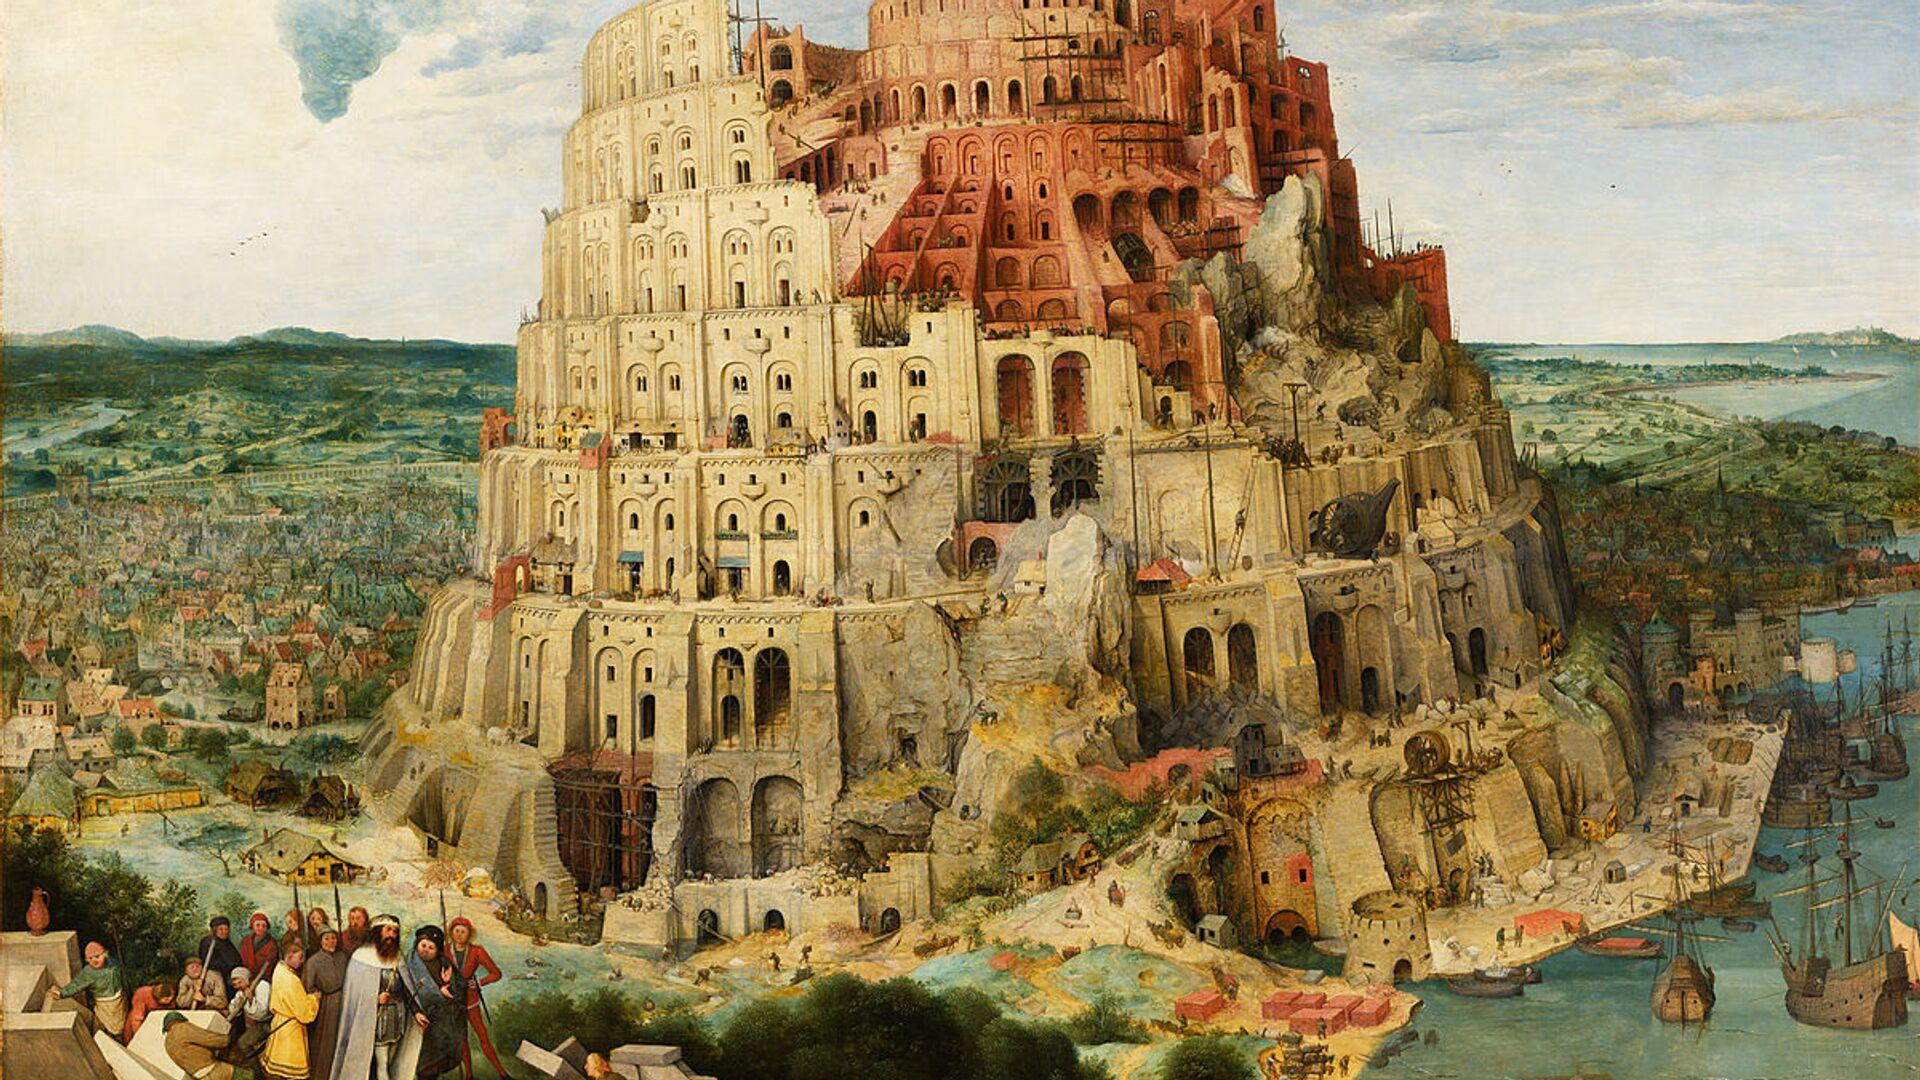 Torre di Babele - Sputnik Italia, 1920, 01.06.2021